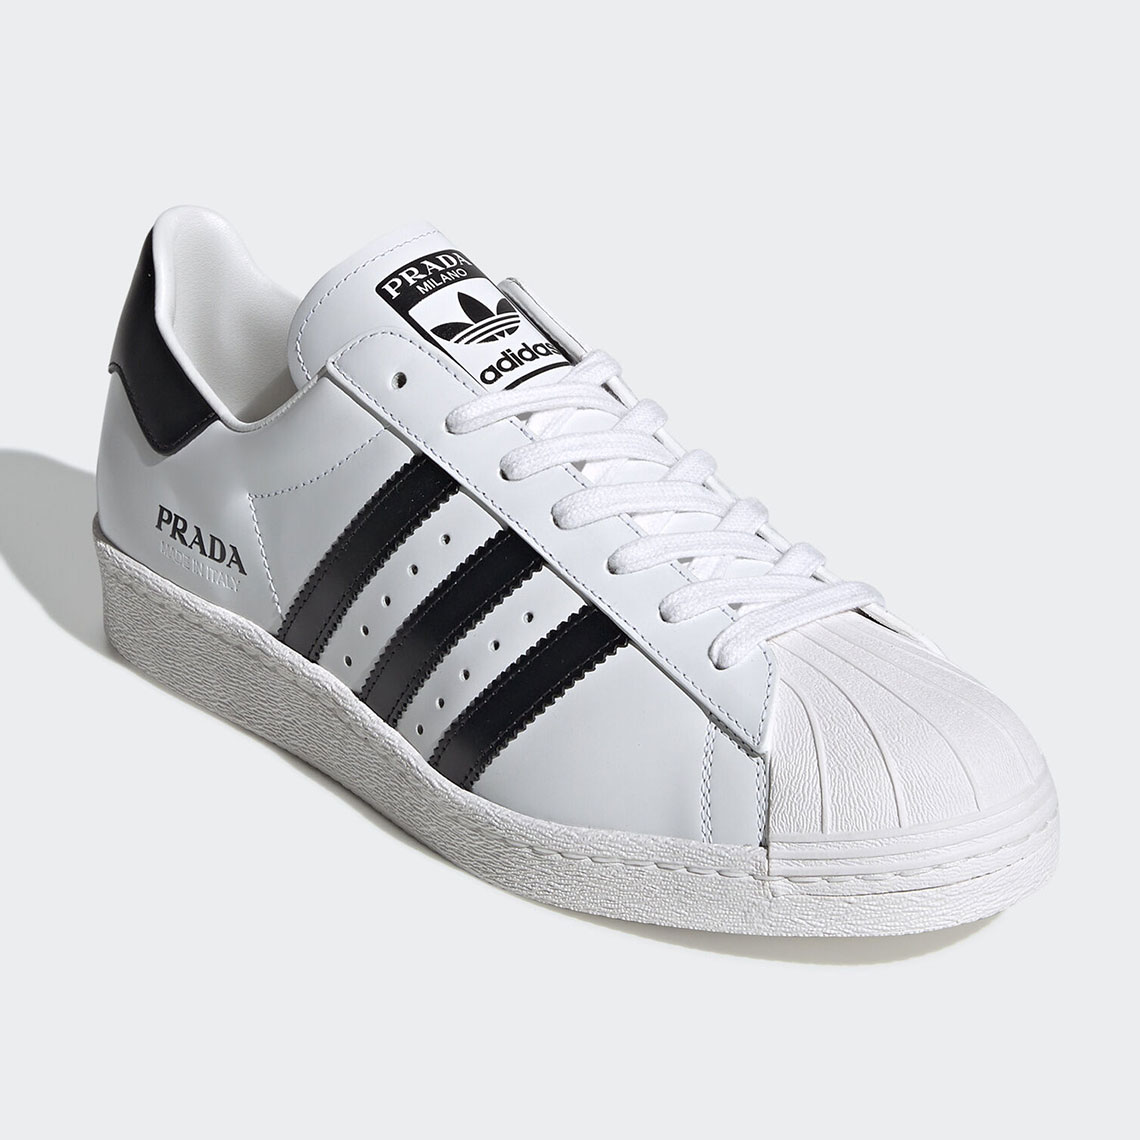 PRADA adidas Superstar - White/Black Release Date | SneakerNews.com